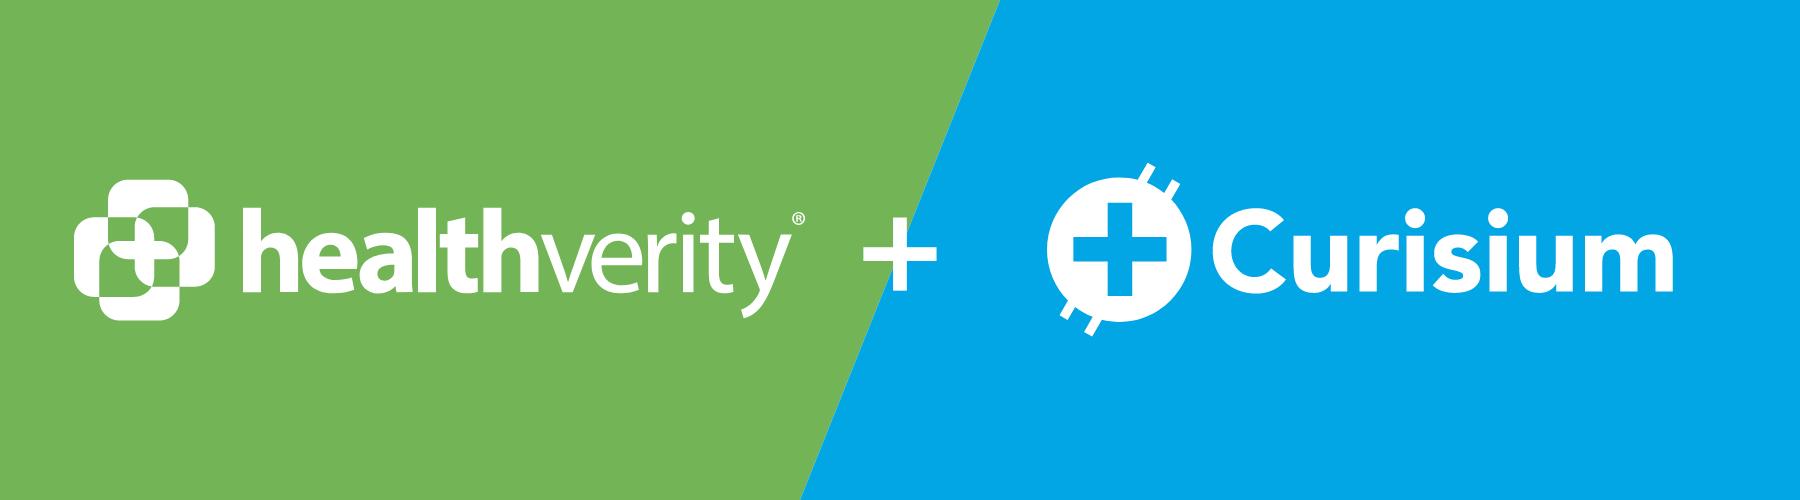 HealthVerity + Curisium